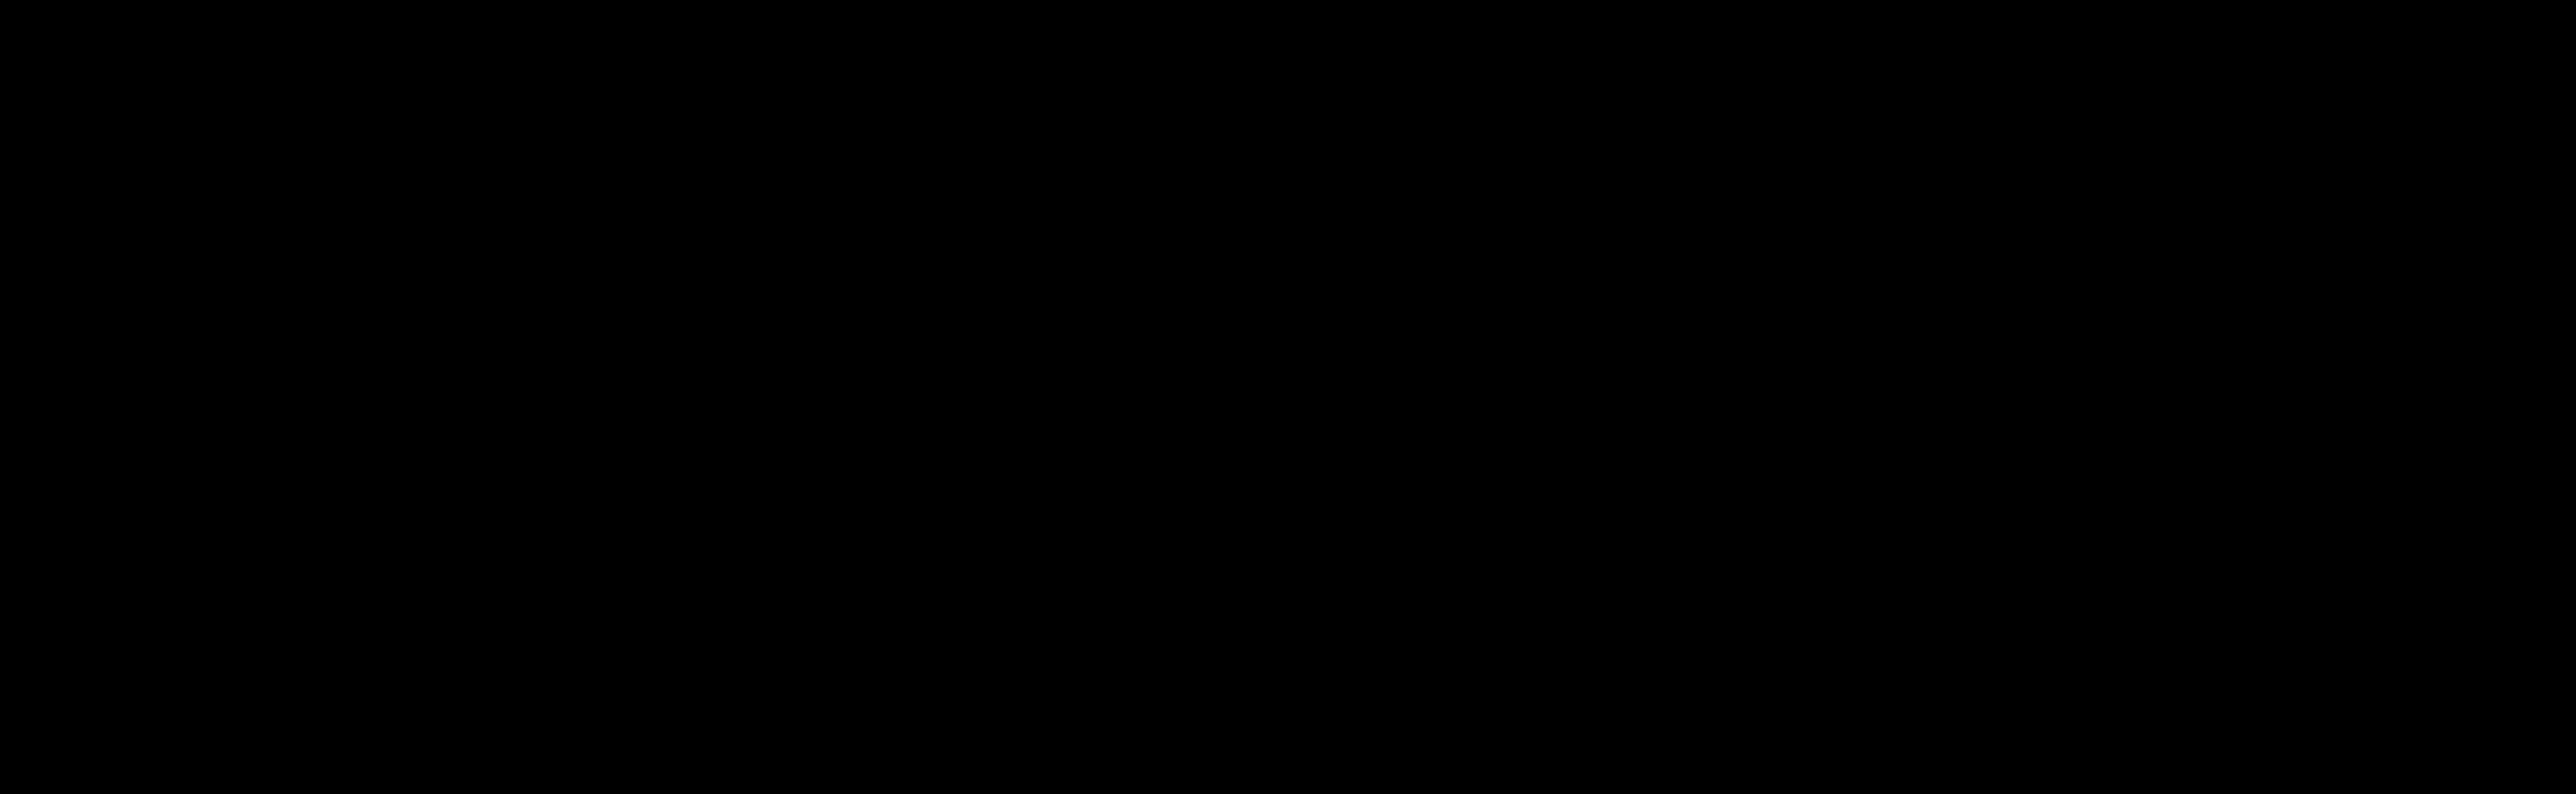 UNIFIED PLATFORM